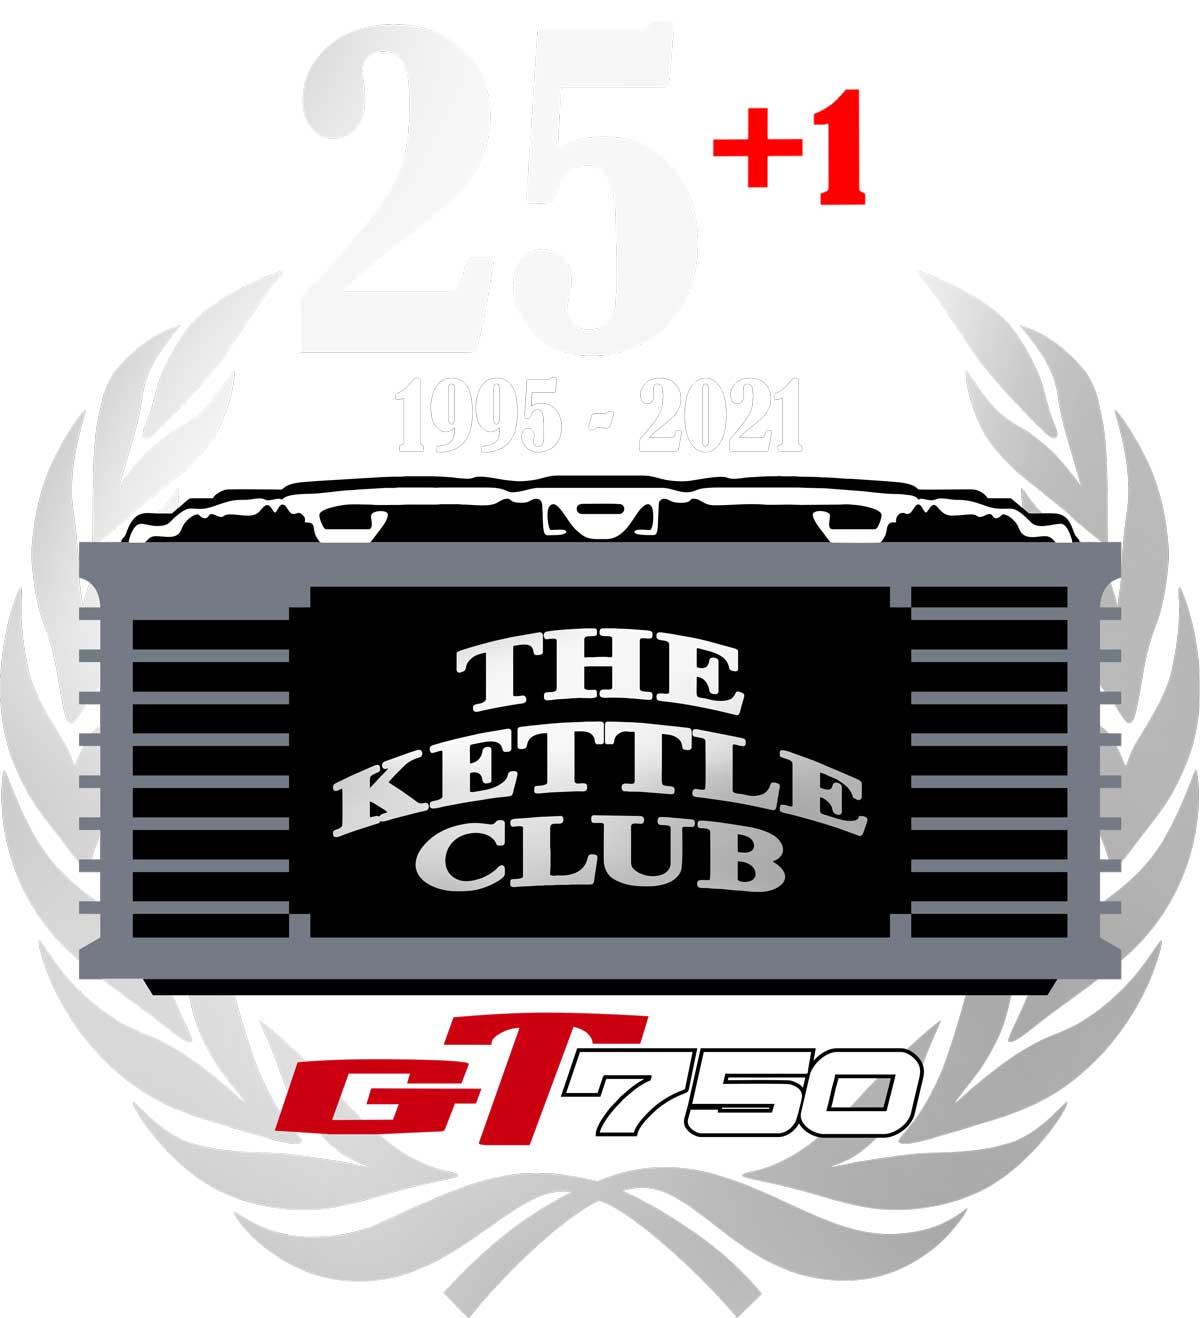 The Kettle Club